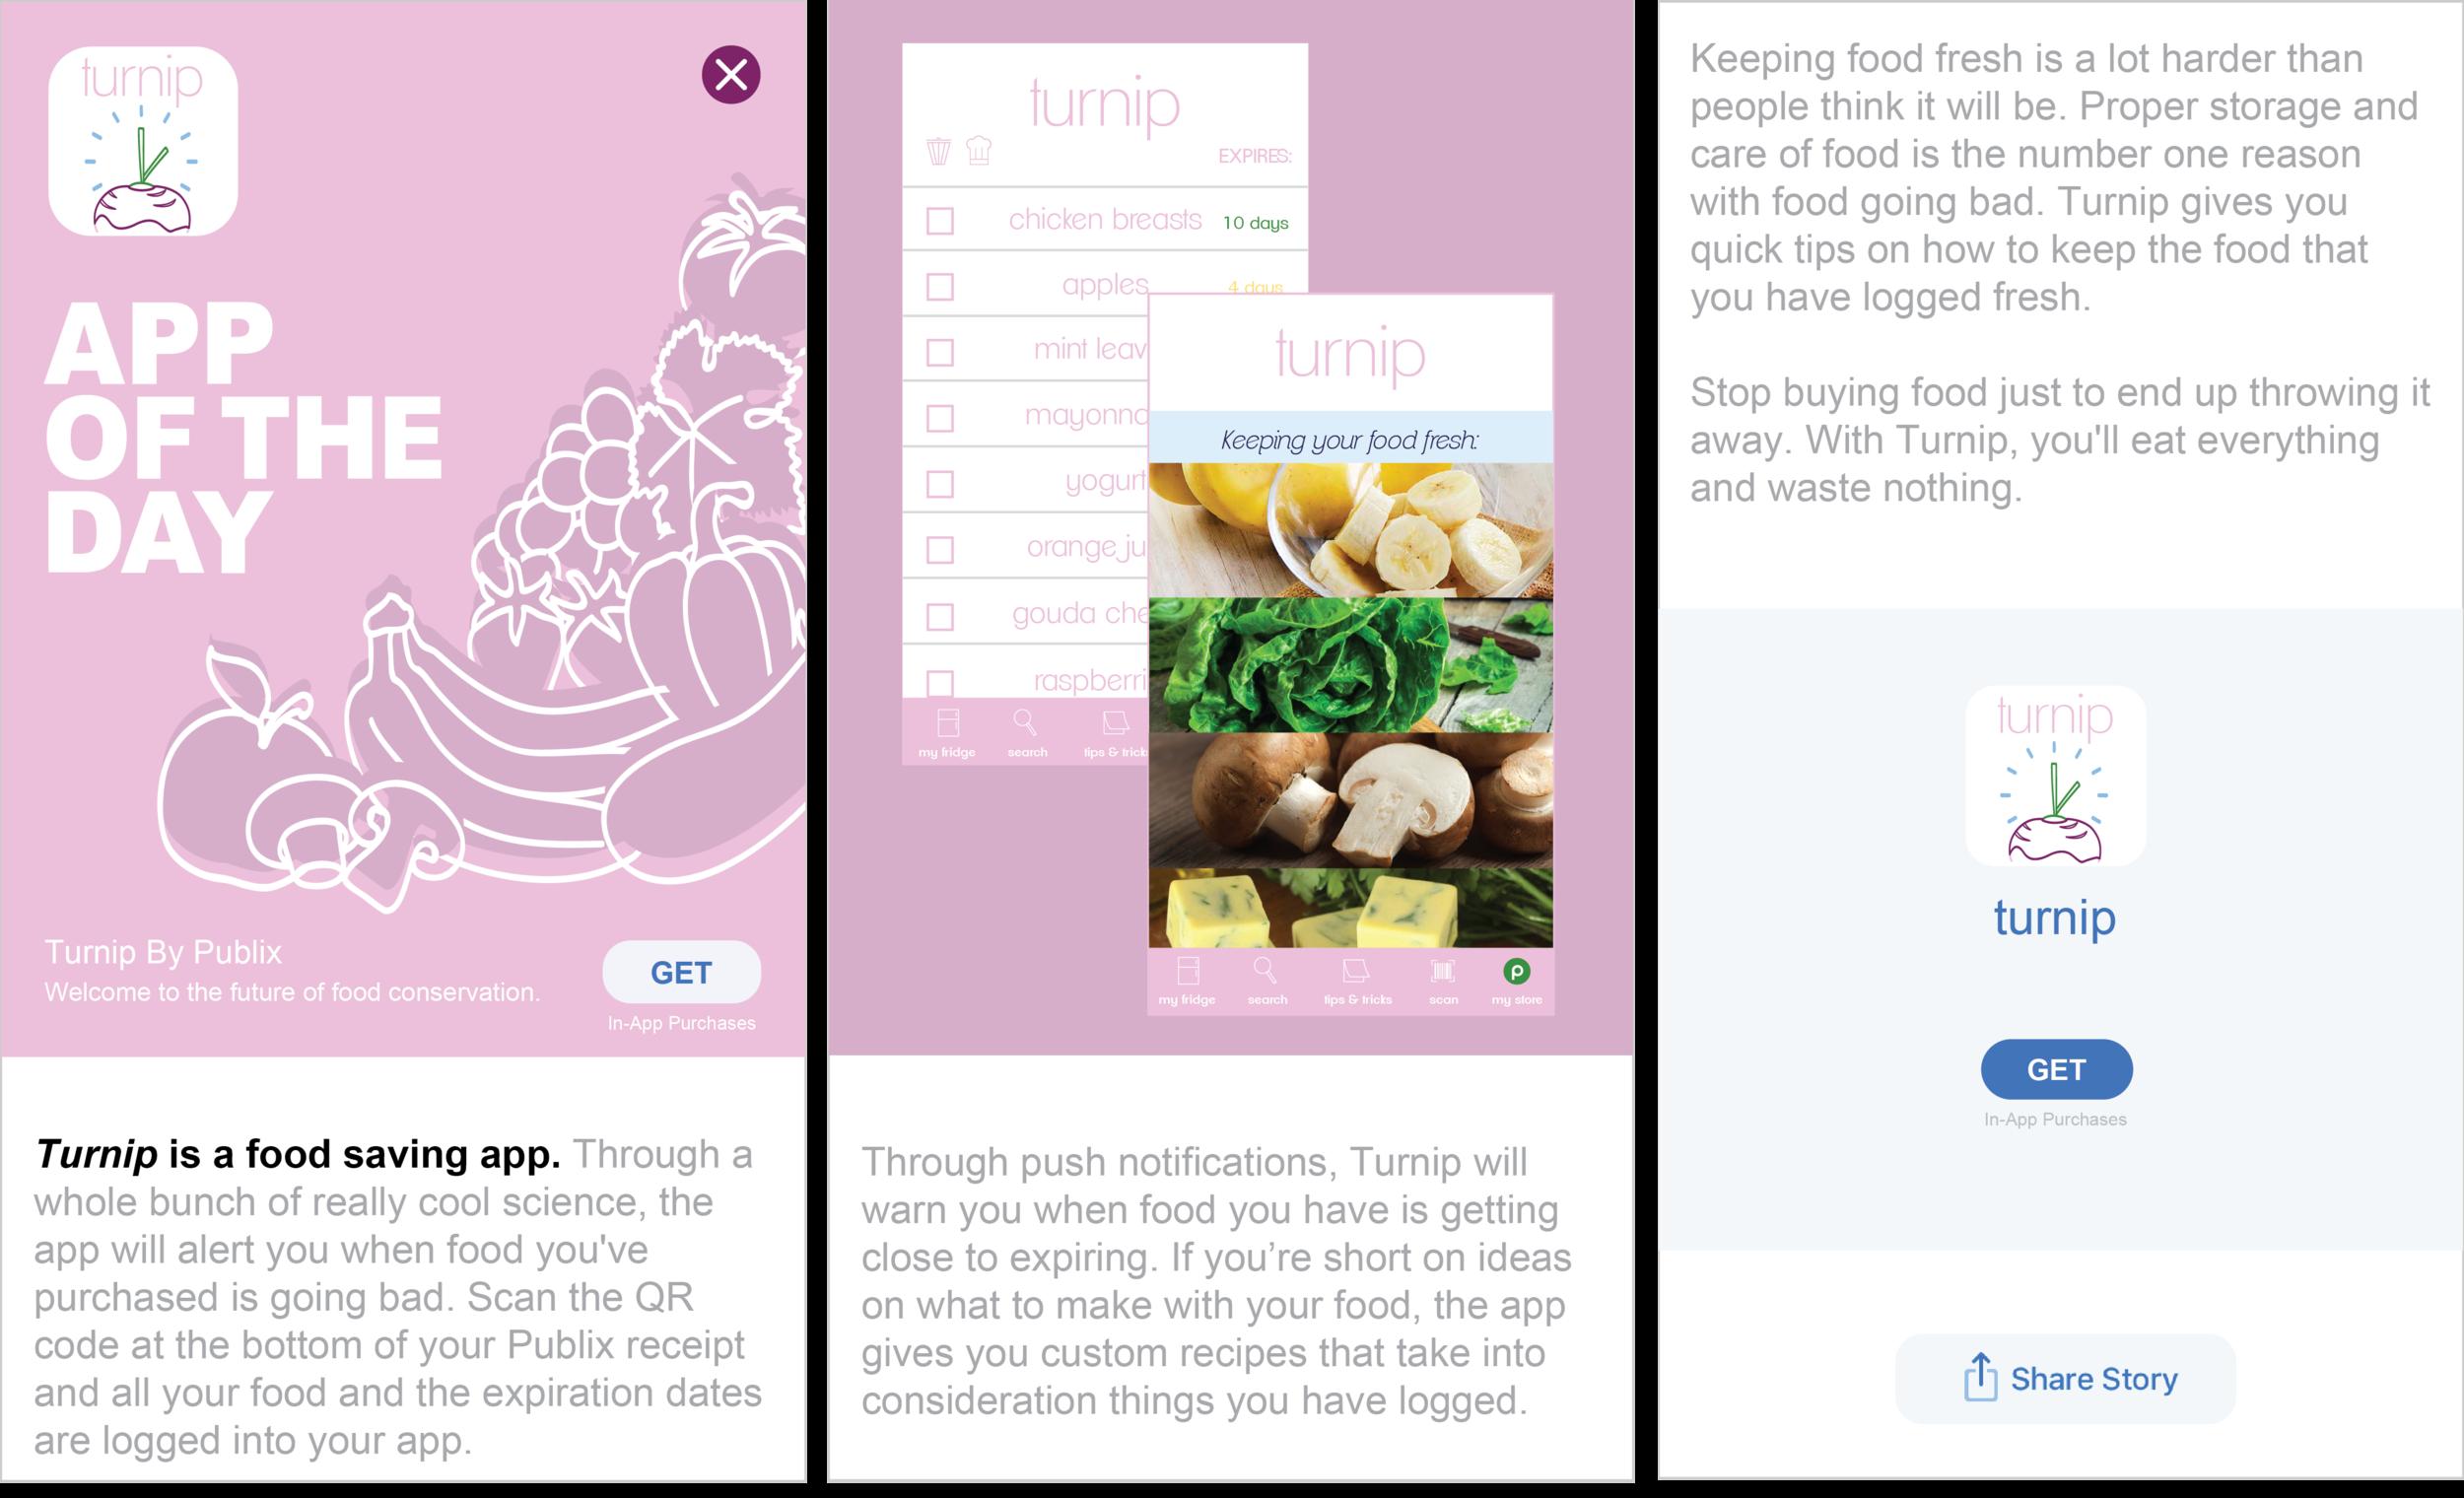 turnip app write up.png